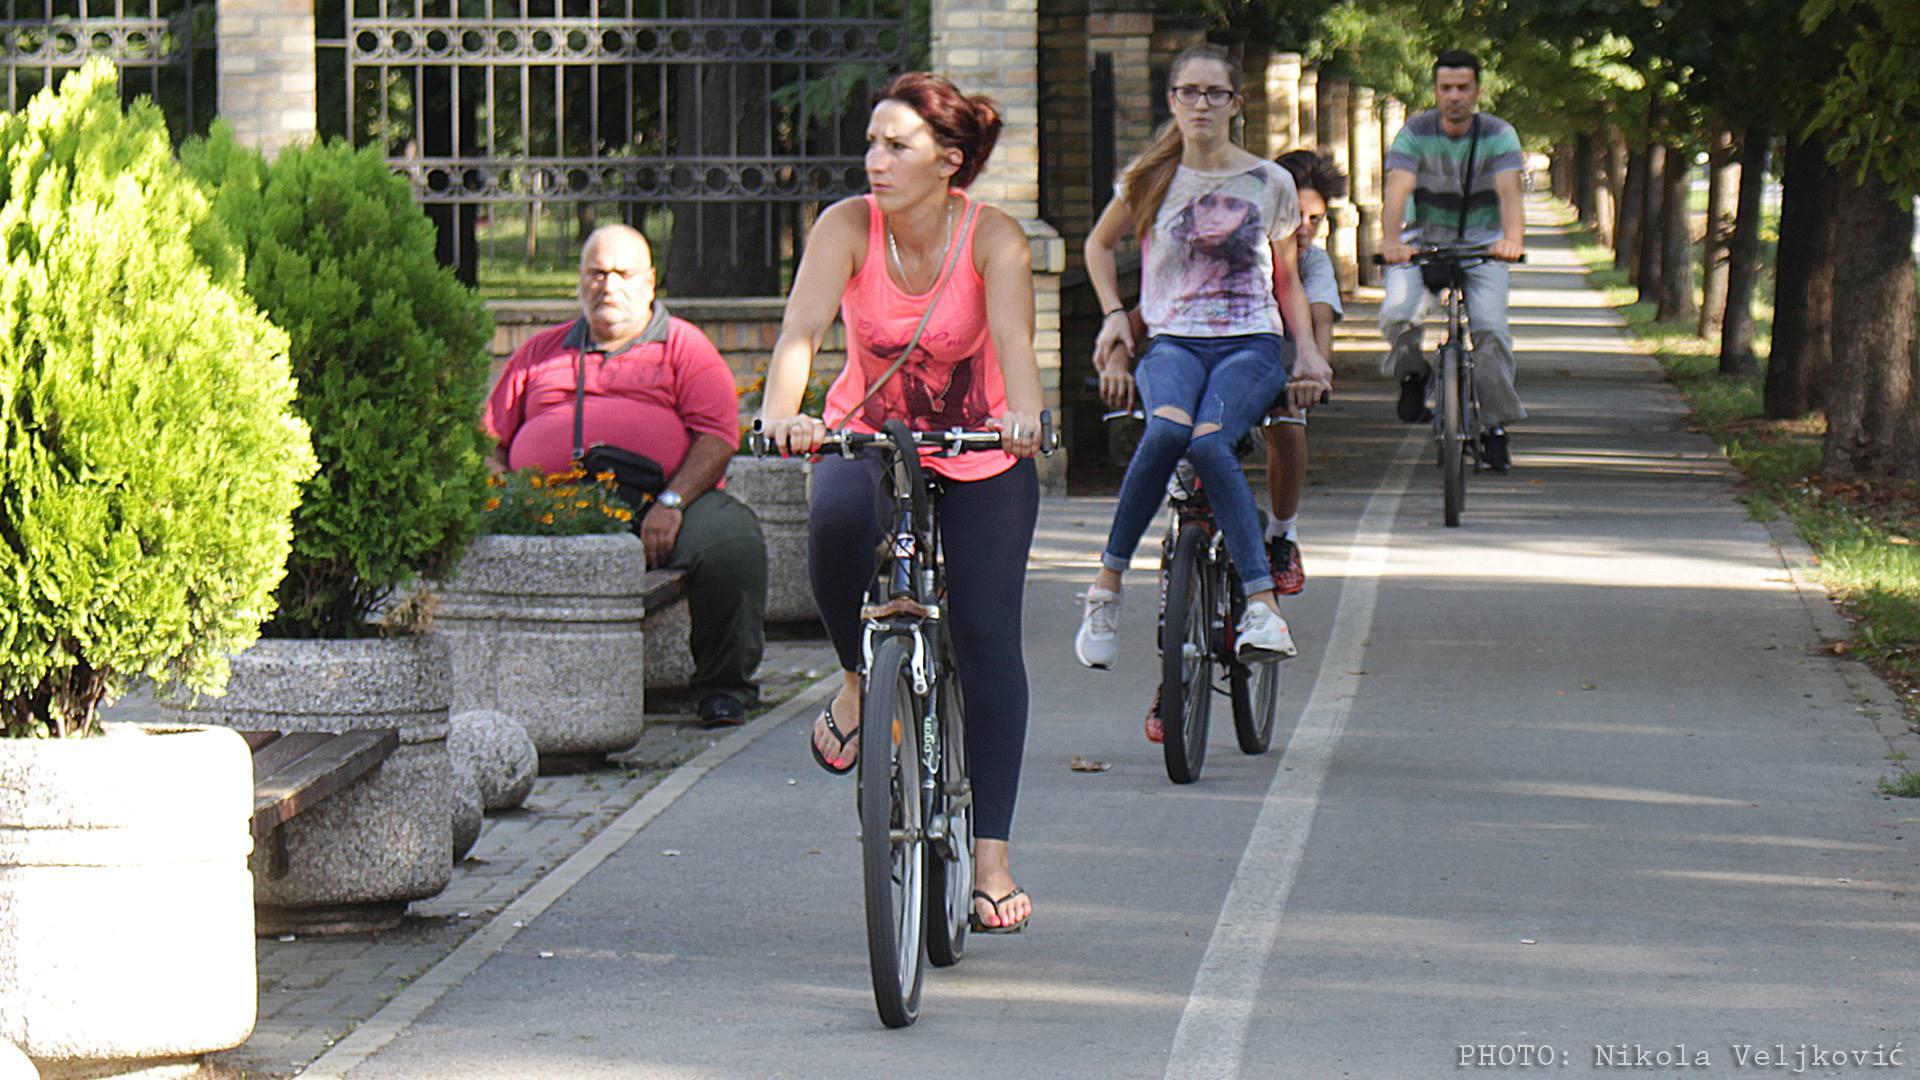 Poziv na promotivnu vožnju bicikala za kraj Rebicycle kampa Pančevo